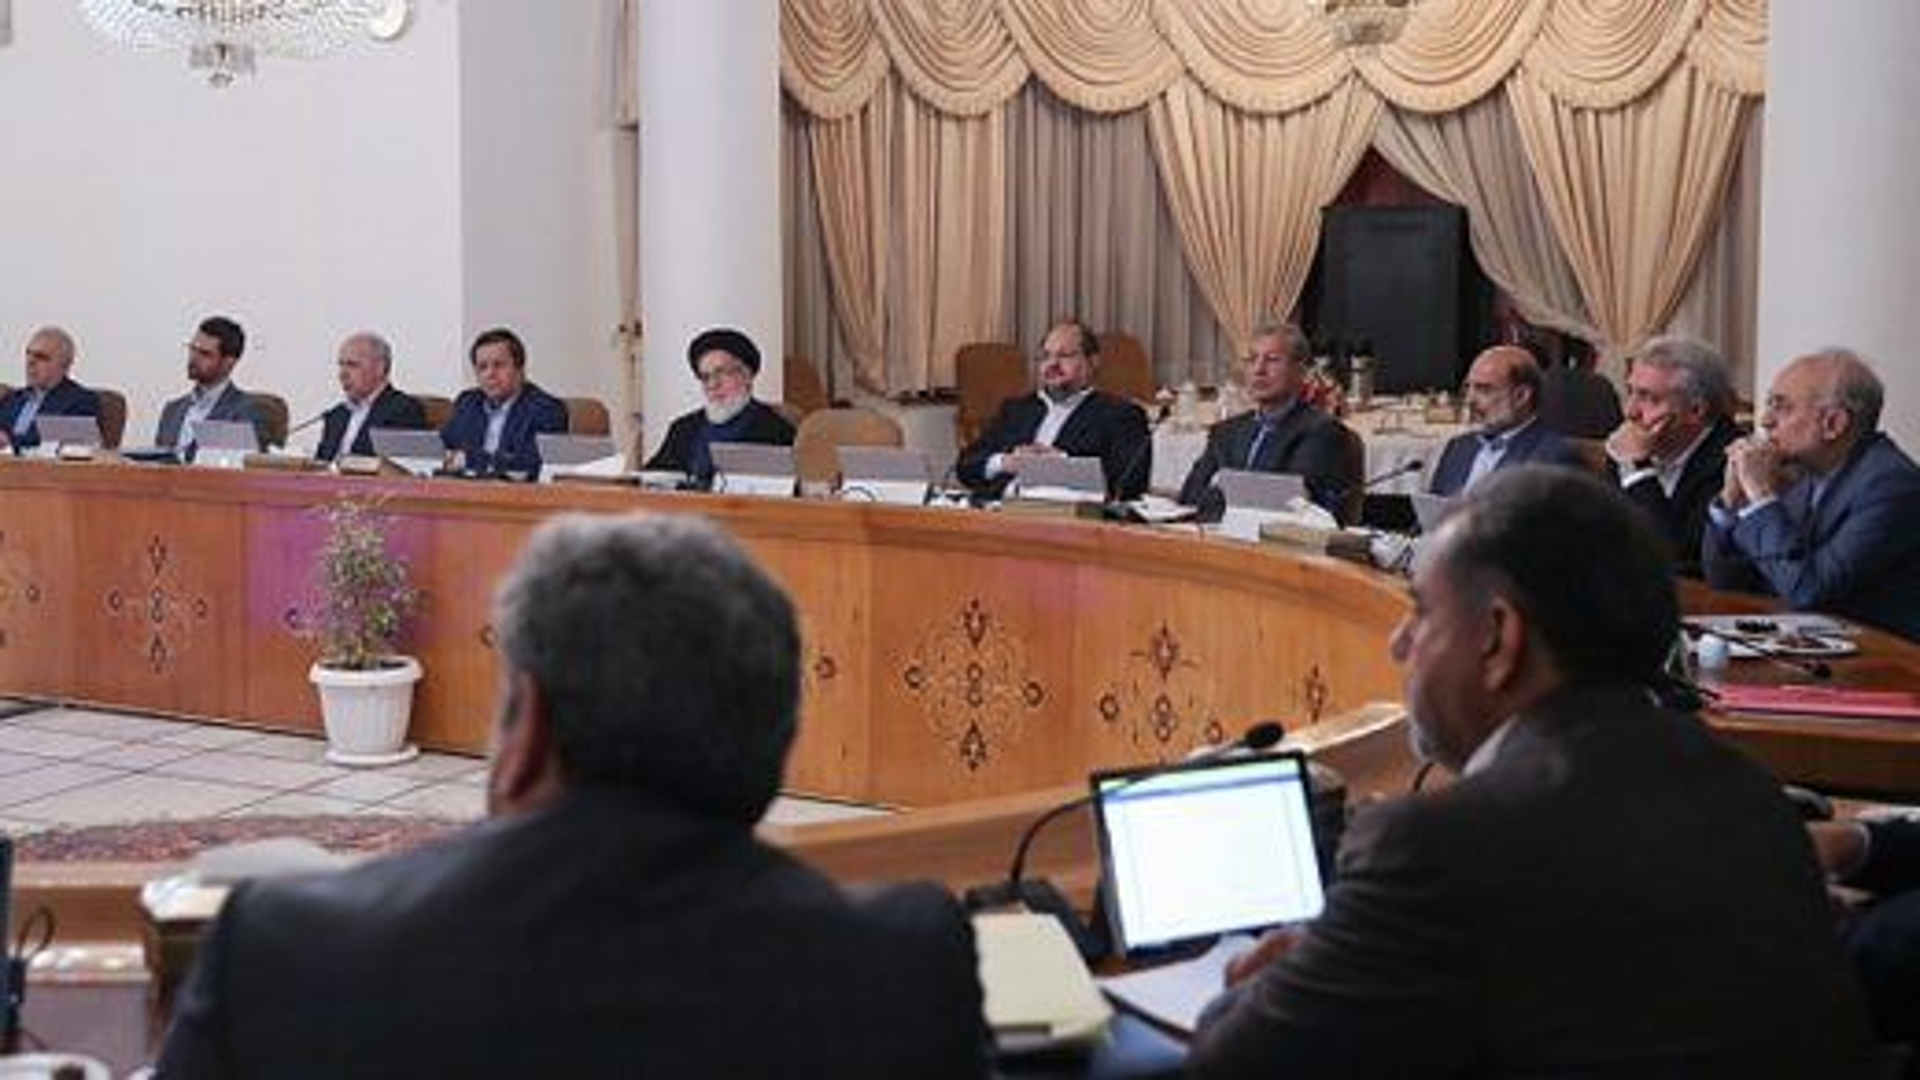 جلسه هیات دولت | تگ